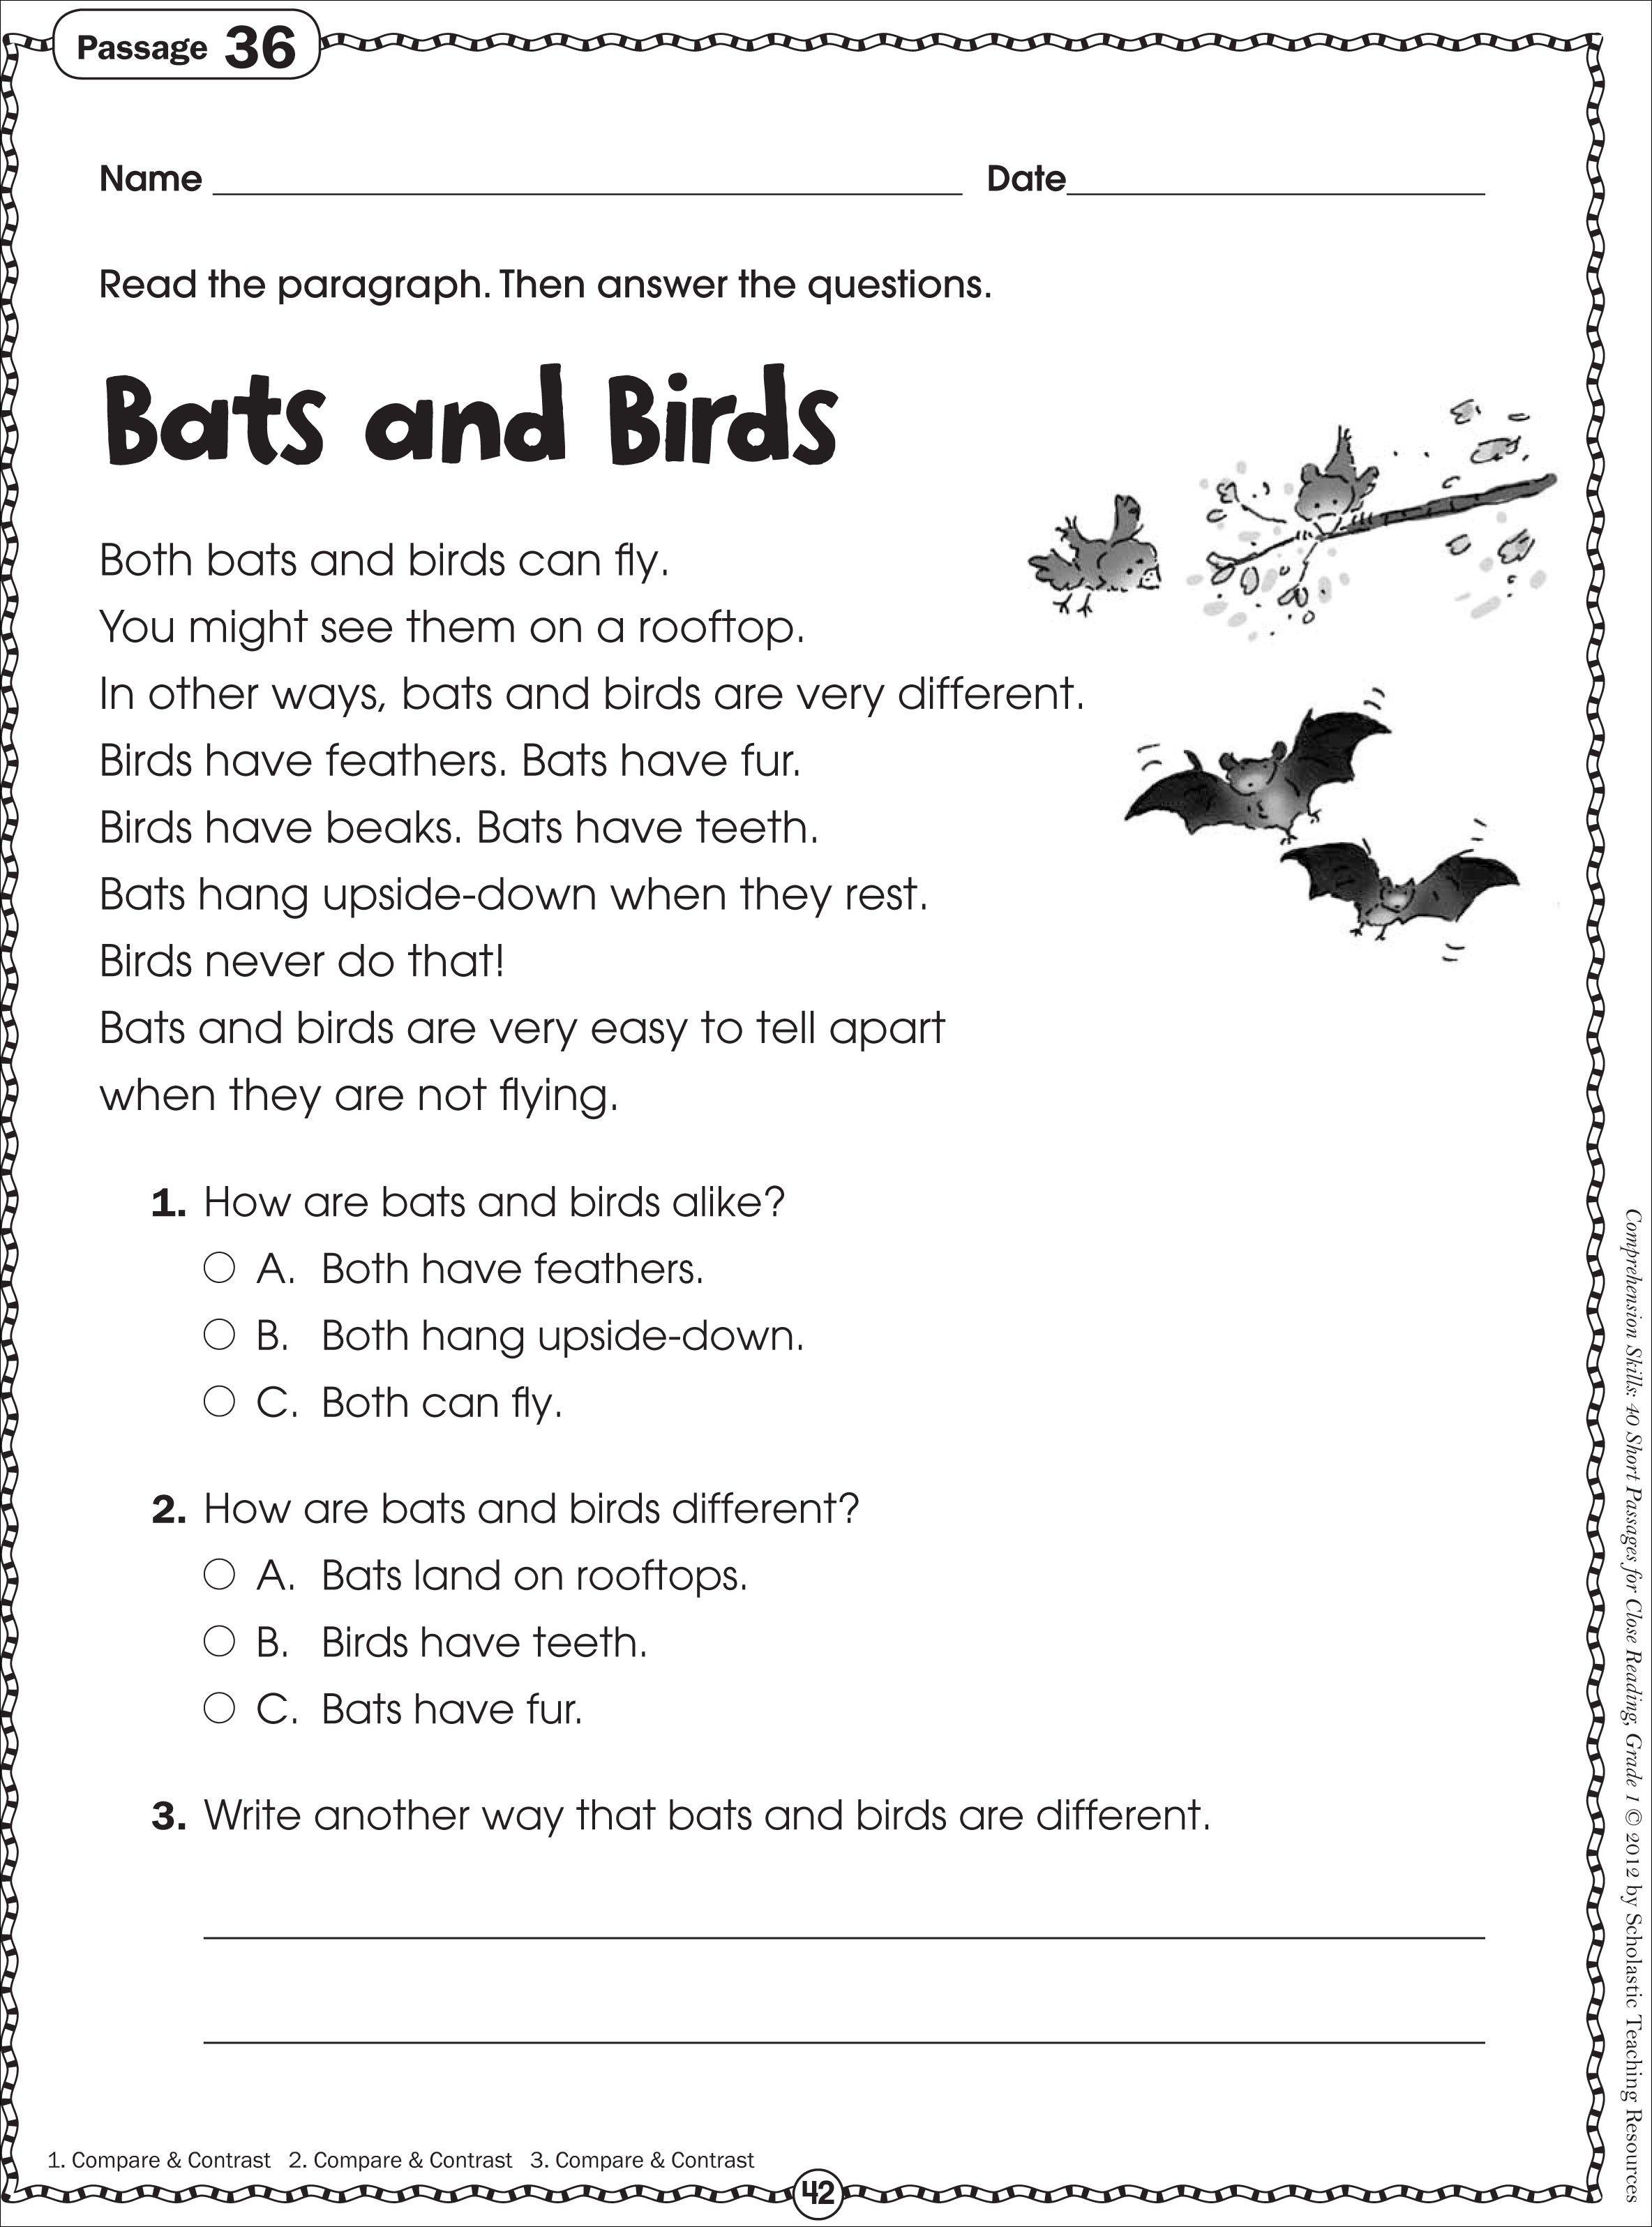 Free Printable Reading Comprehension Worksheets For Kindergarten - Free Printable Easy Readers For Kindergarten